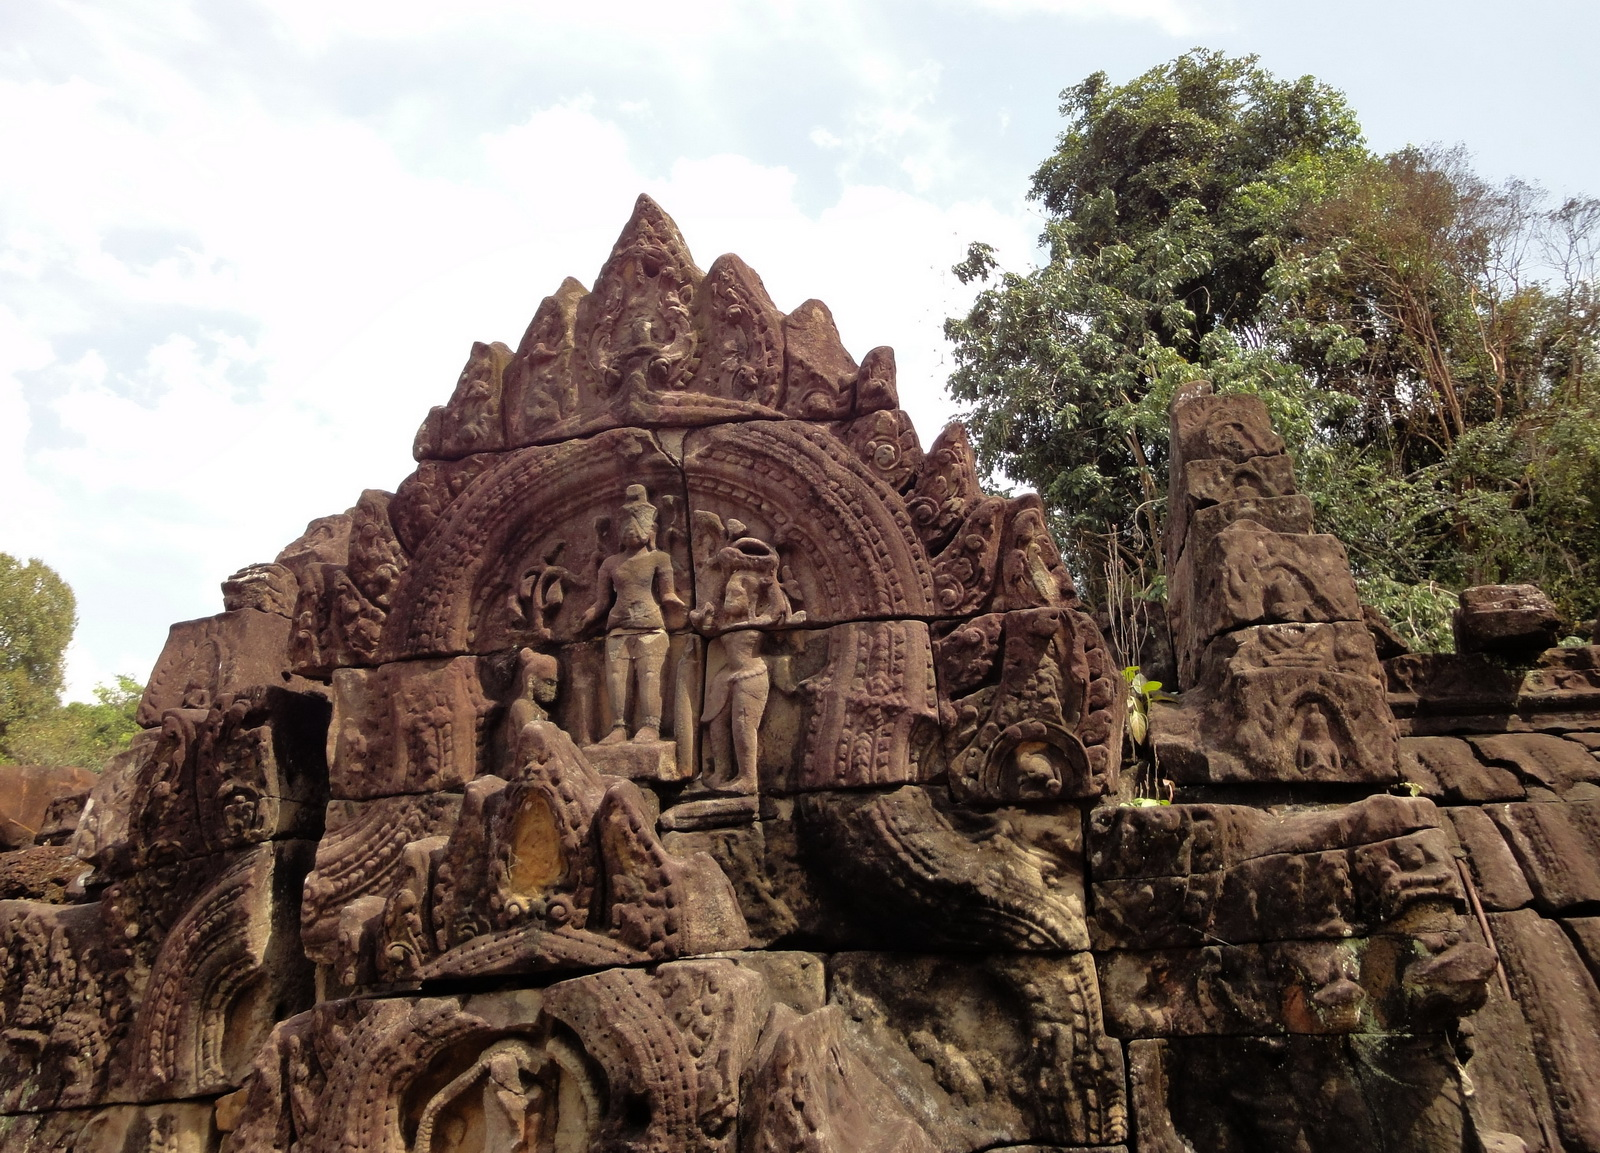 Neak Pean Temple Bas reliefs Jan 2010 01